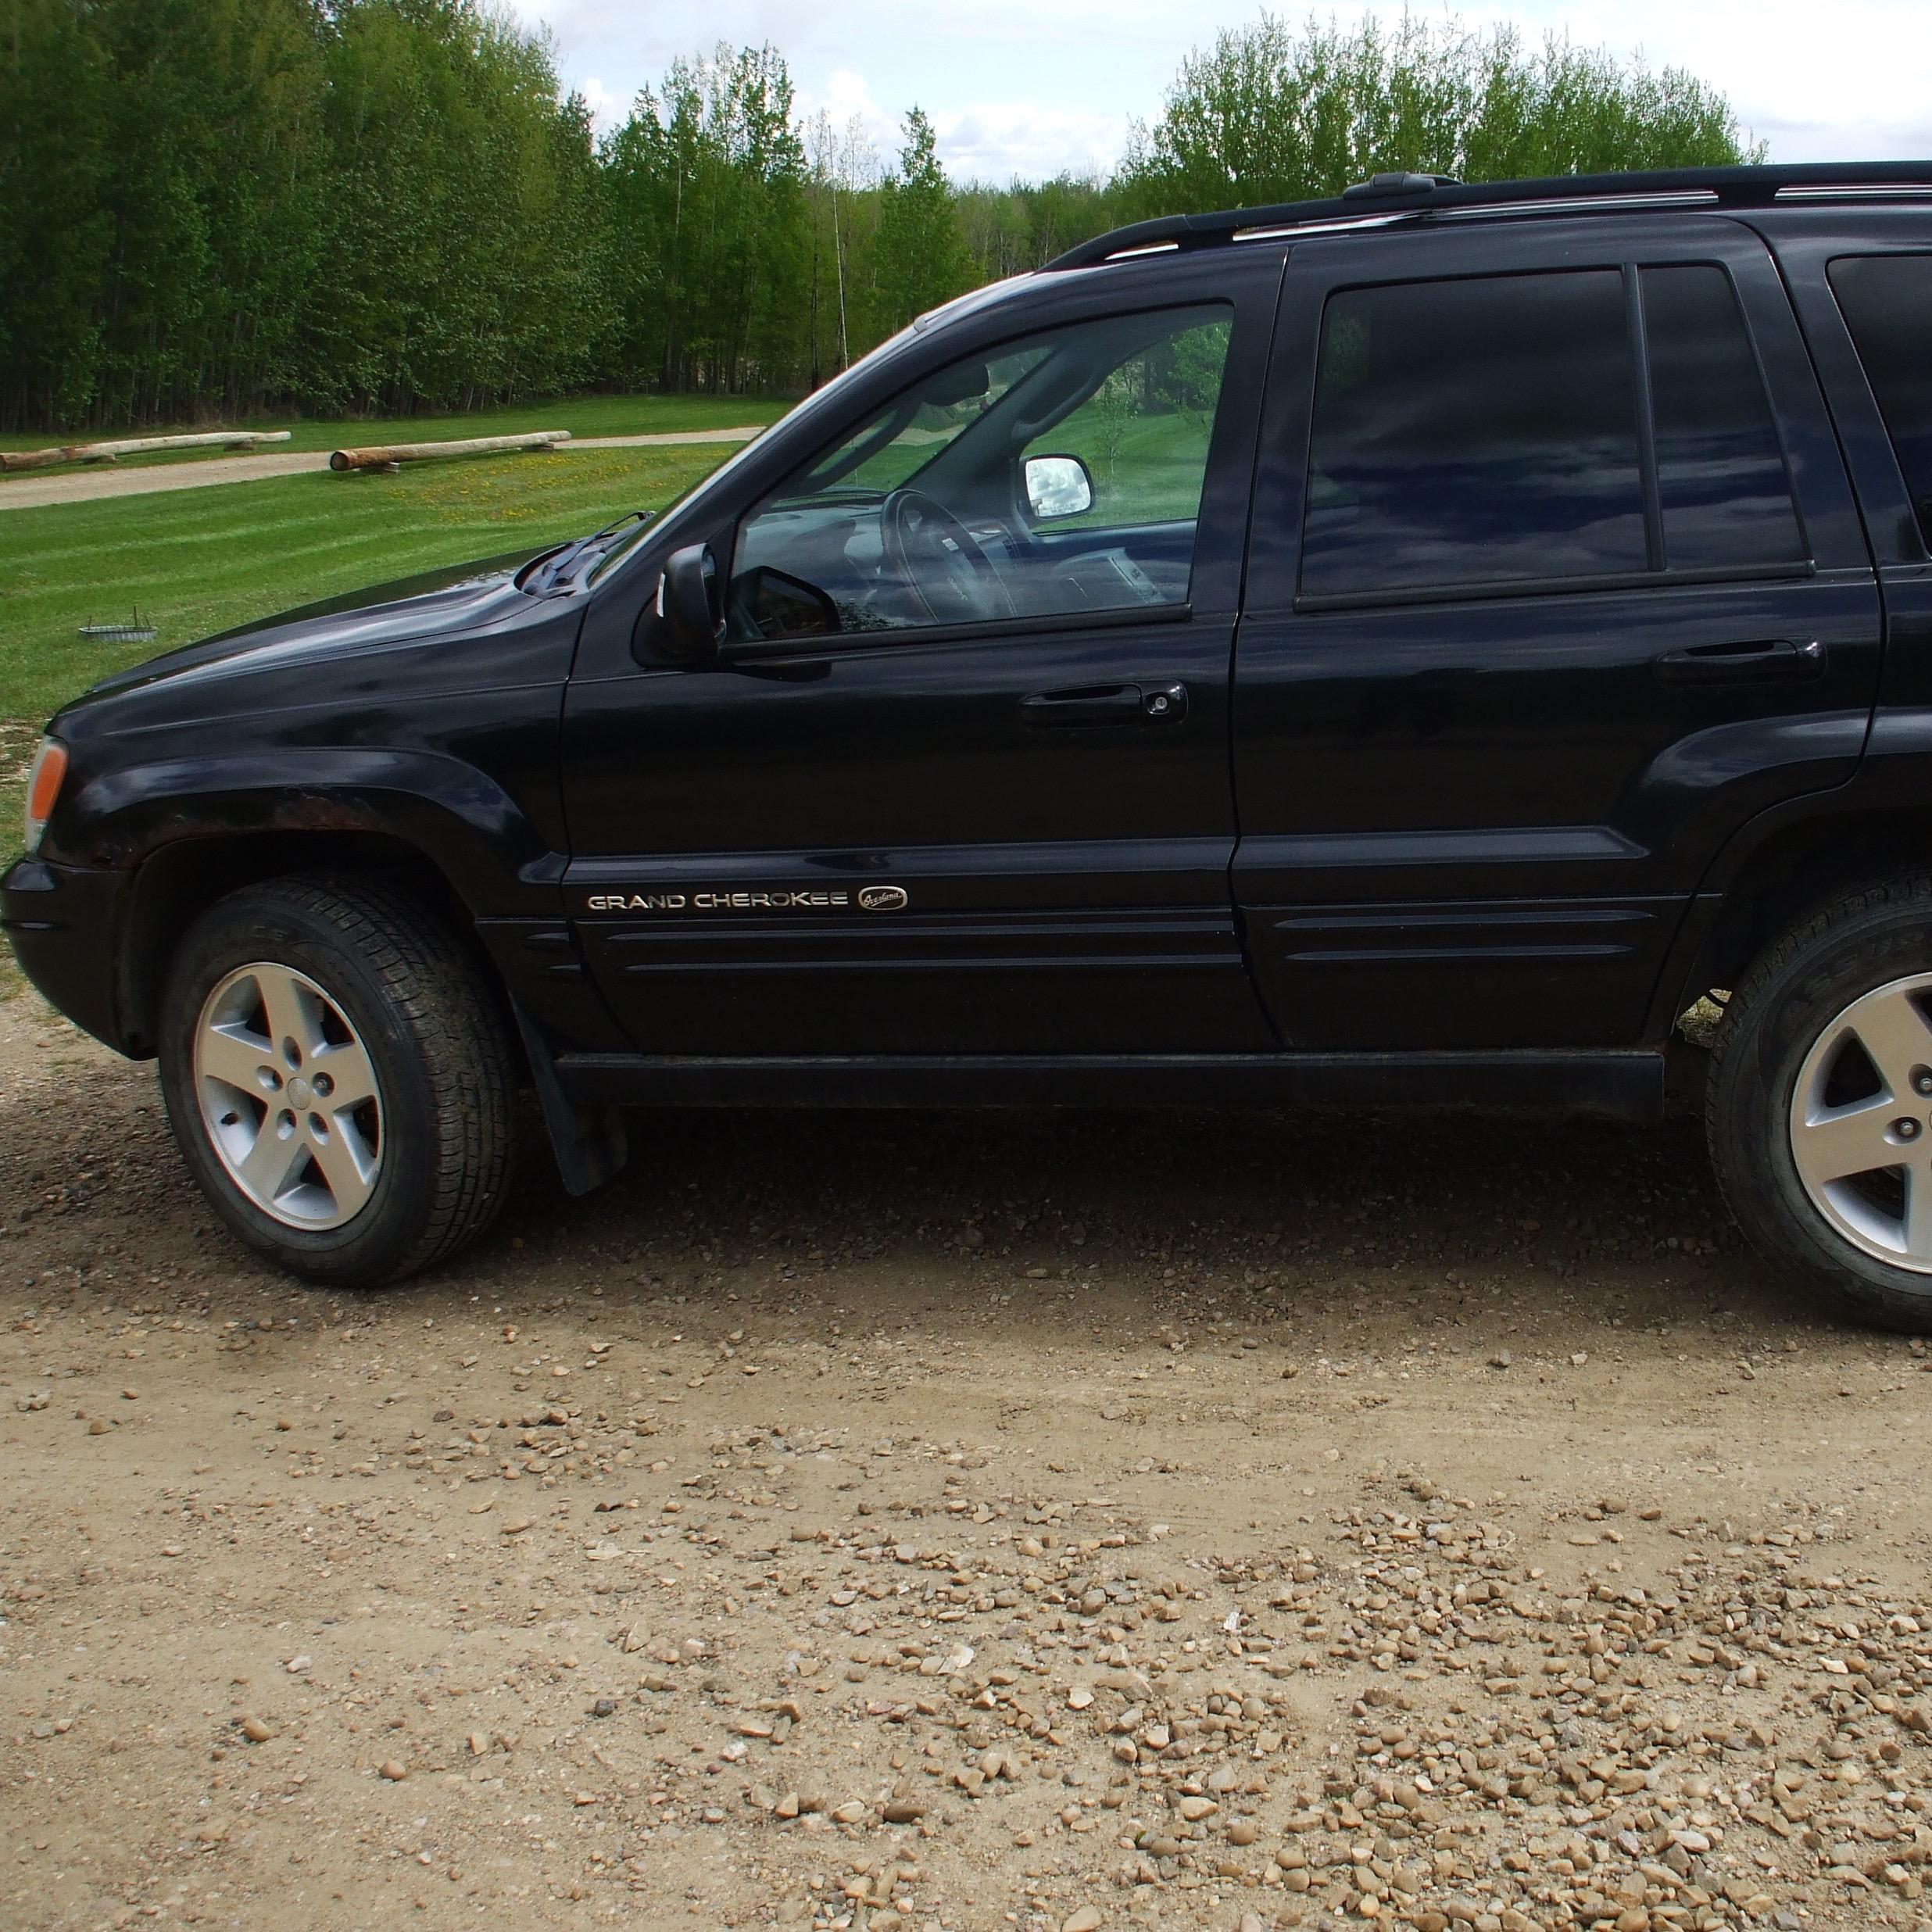 2002 Jeep, SUV ,black, 224,000 km sn: 1J8GW68J73C528479 - Image 2 of 6